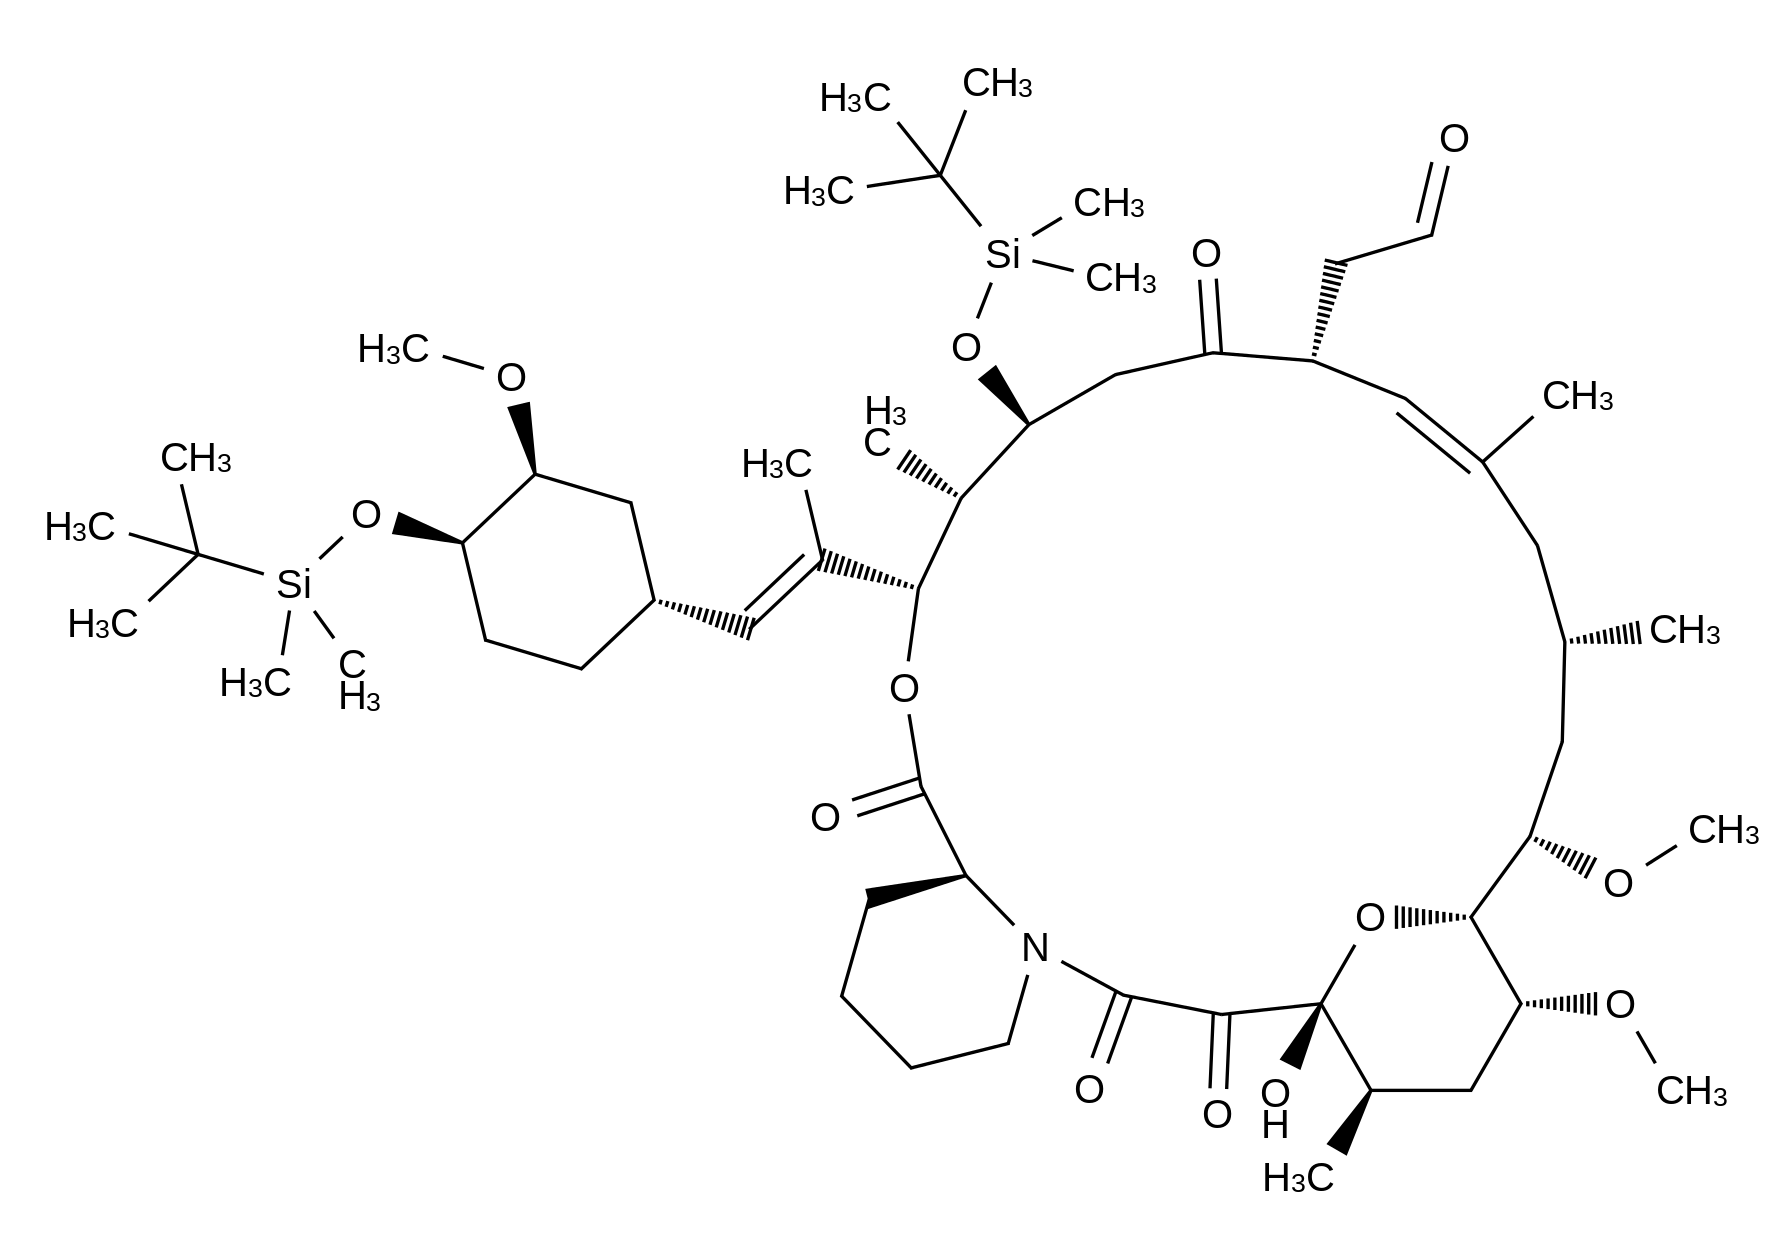 37-Desmethylene 24,33-Bis-O-(tert-butyldimethylsilyl)-37-oxo-FK-506